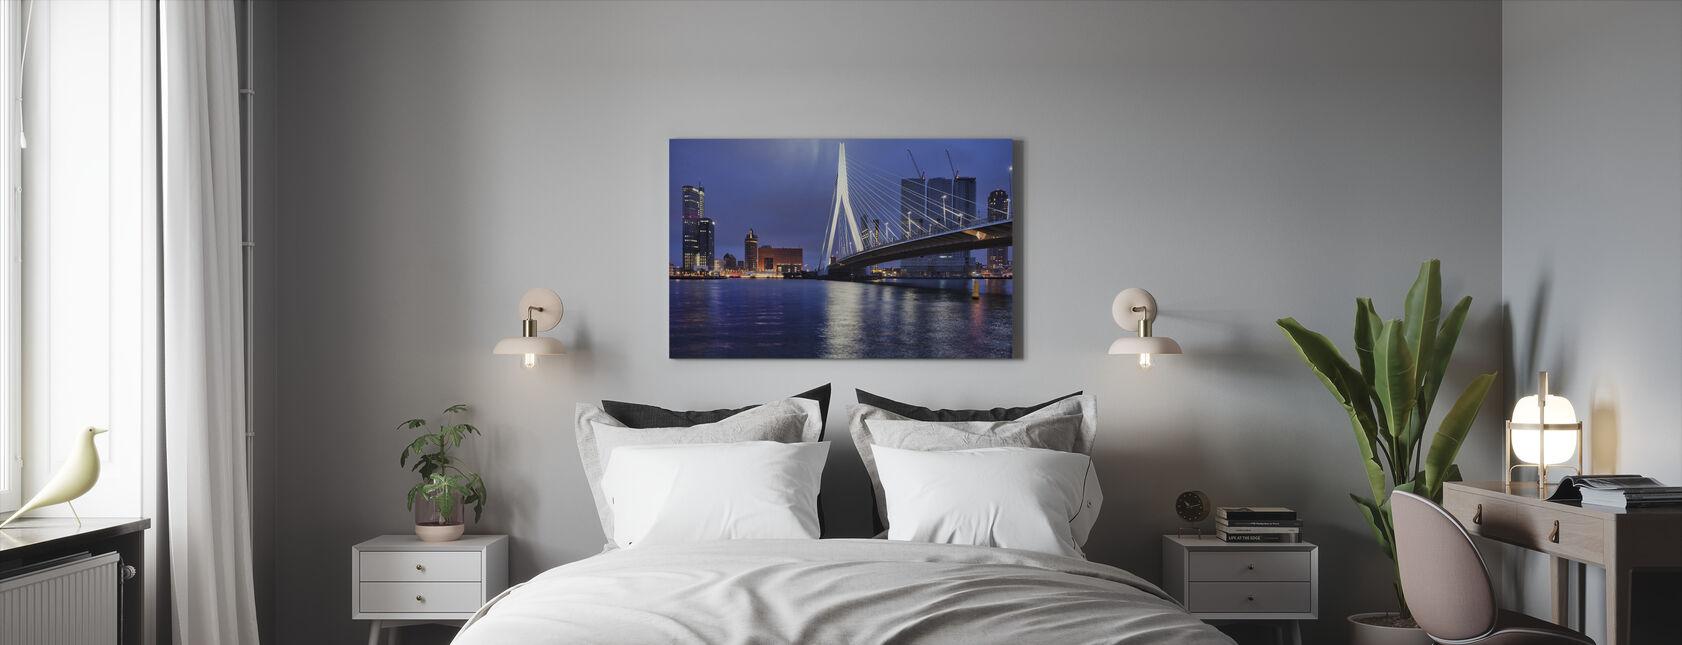 Stad Rotterdam bij Nacht - Canvas print - Slaapkamer